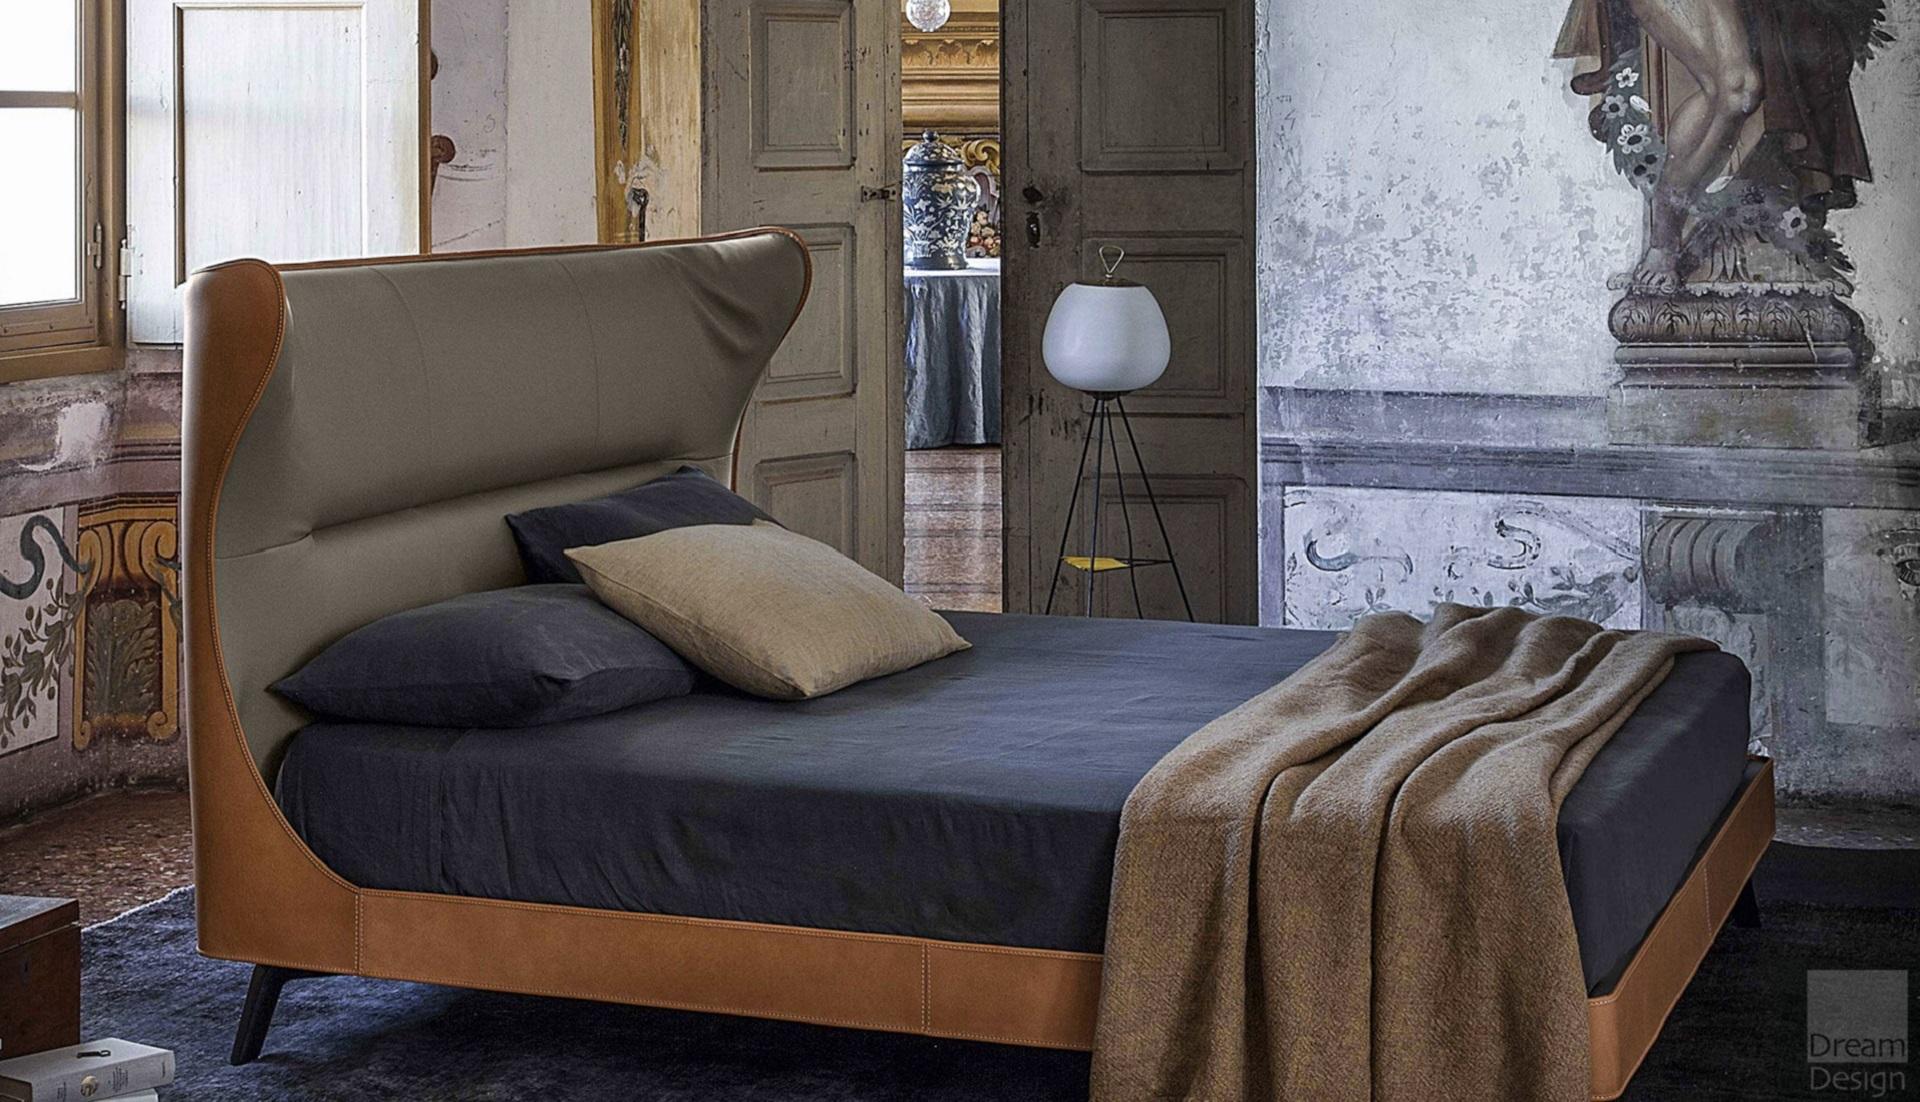 poltrona frau mamy blue bed dream design interiors ltd. Black Bedroom Furniture Sets. Home Design Ideas